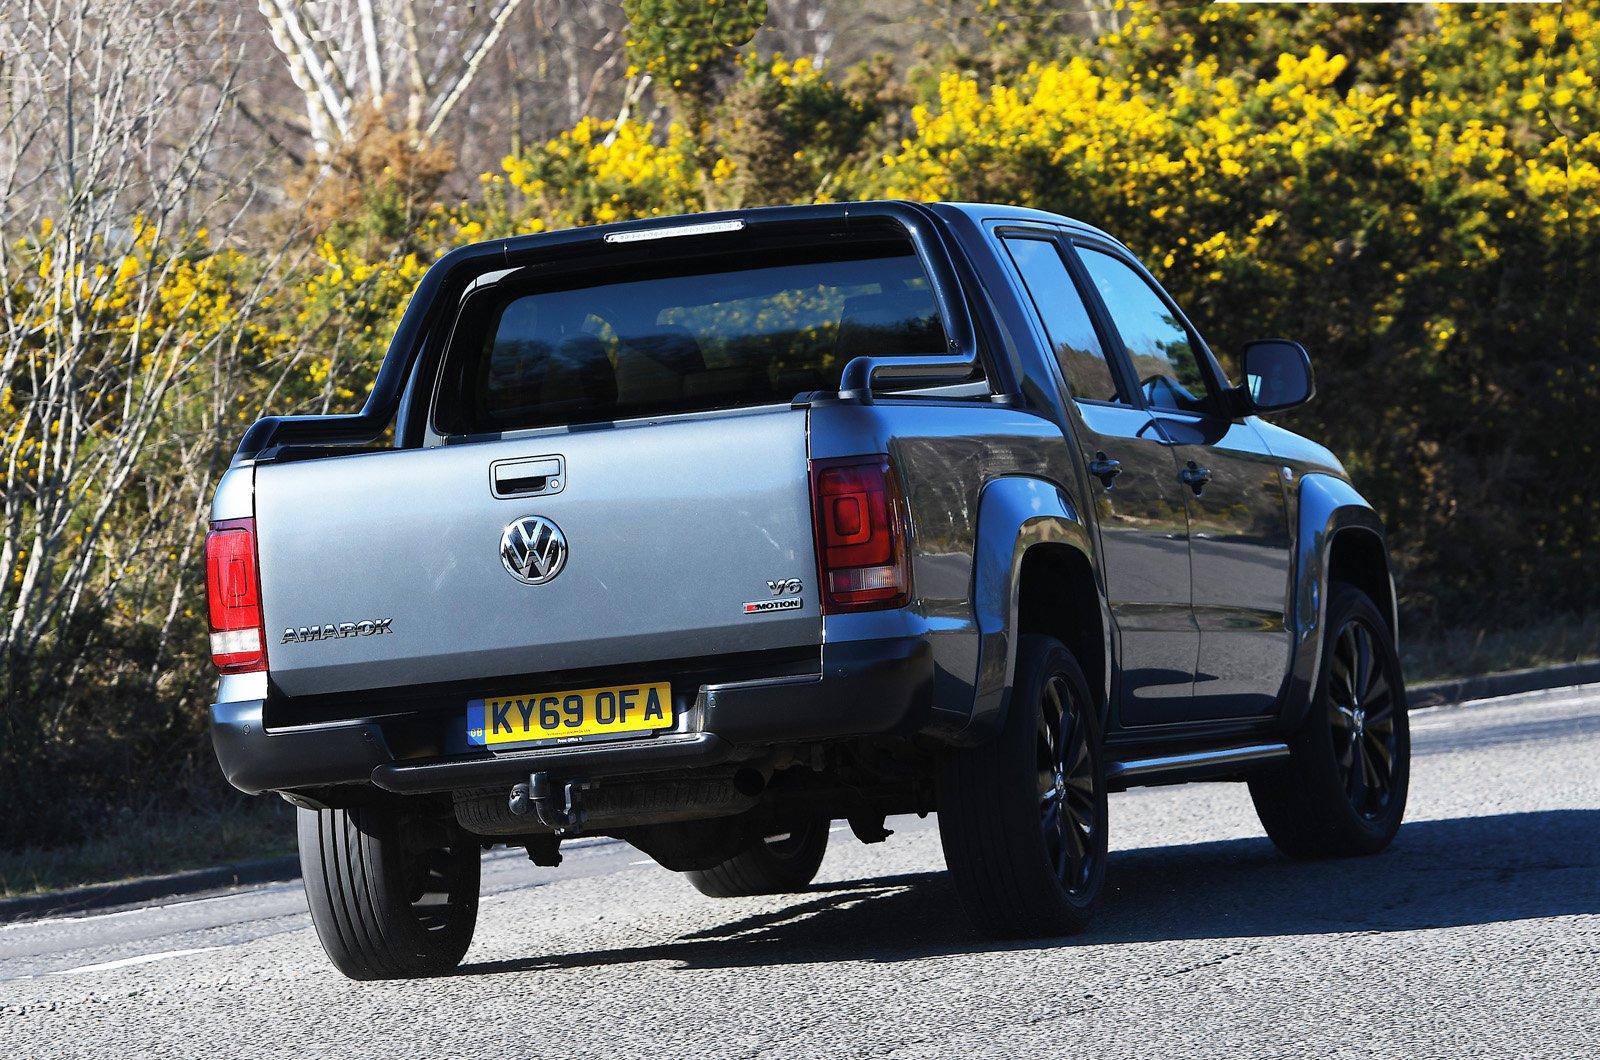 Volkswagen Amarok rear cornering - 69 plate